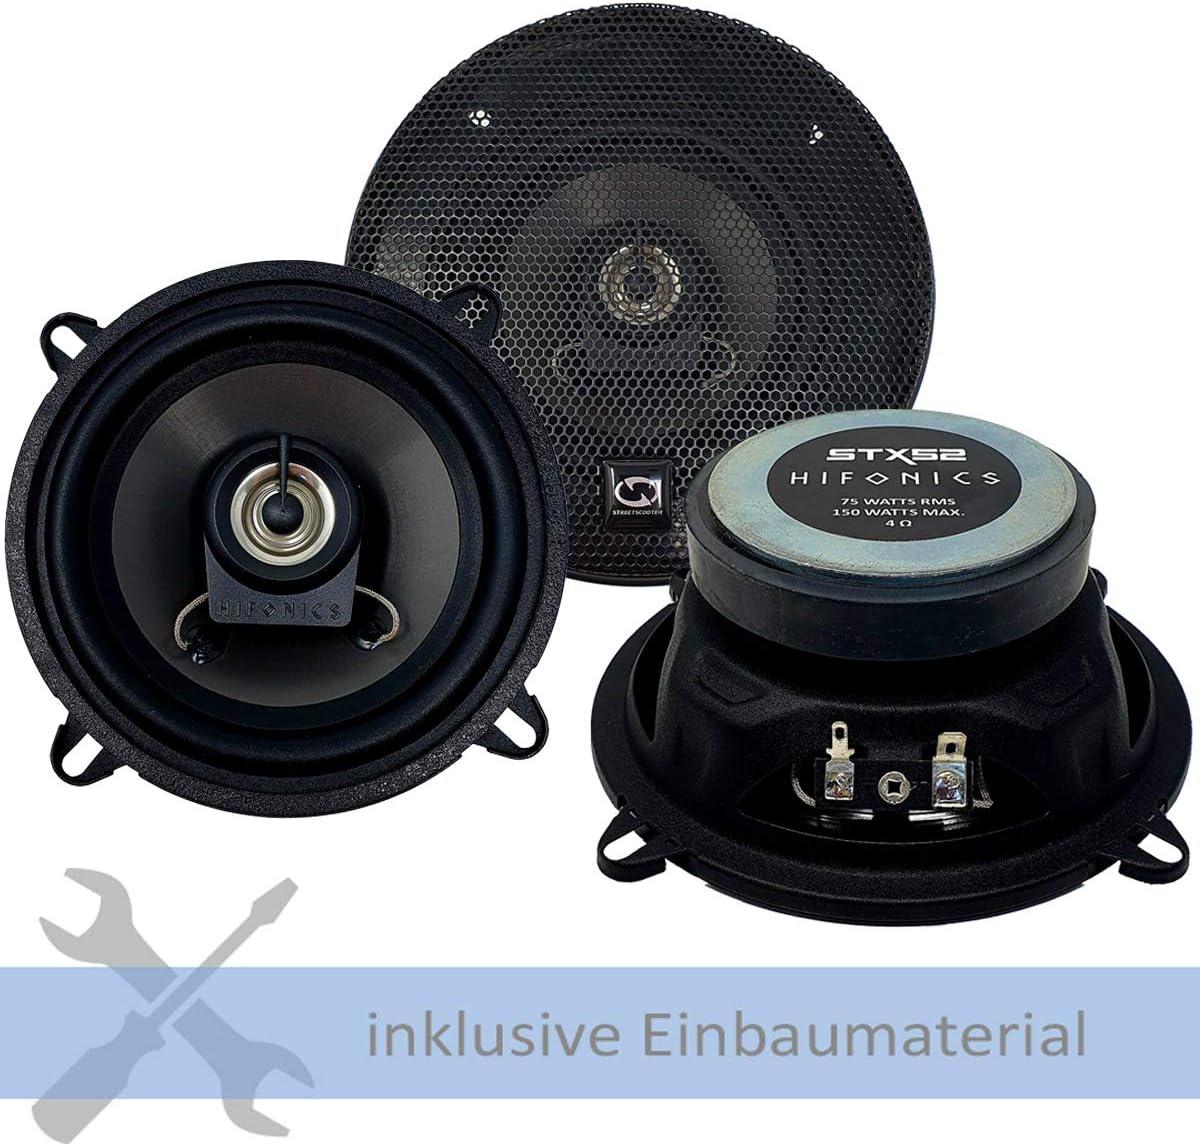 ab 2008 T/üren Front FW//KW Hifonics Lautsprecher STX-52 300W 130 mm 2 Wege Koax passend f/ür Renault Kangoo